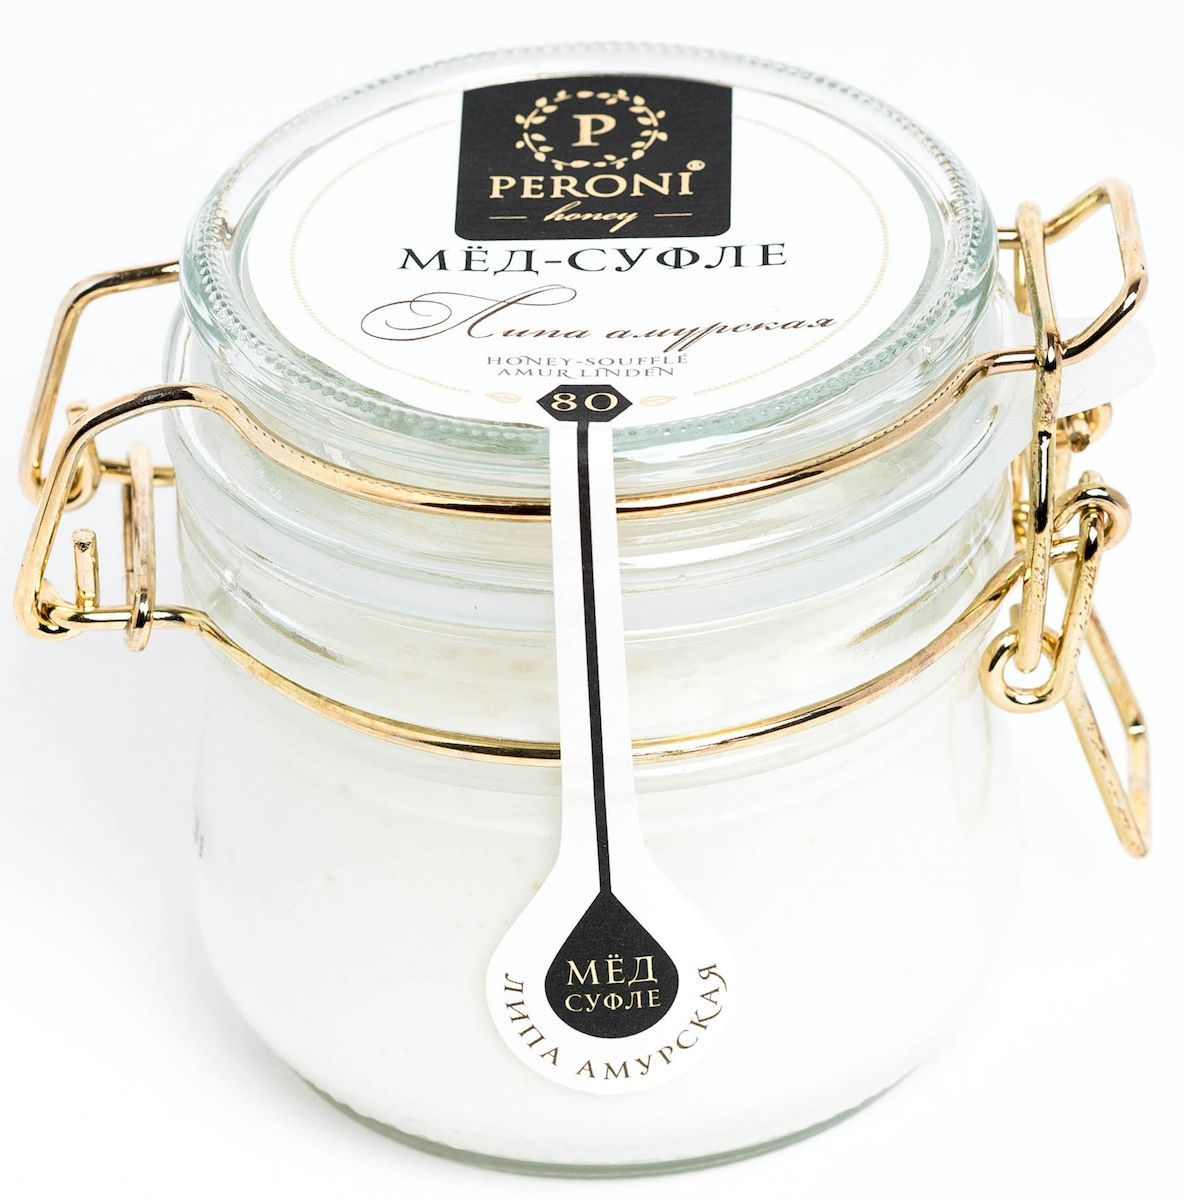 Peroni Липа амурская мед-суфле, 230 г peroni молочный цветок мед суфле 30 г